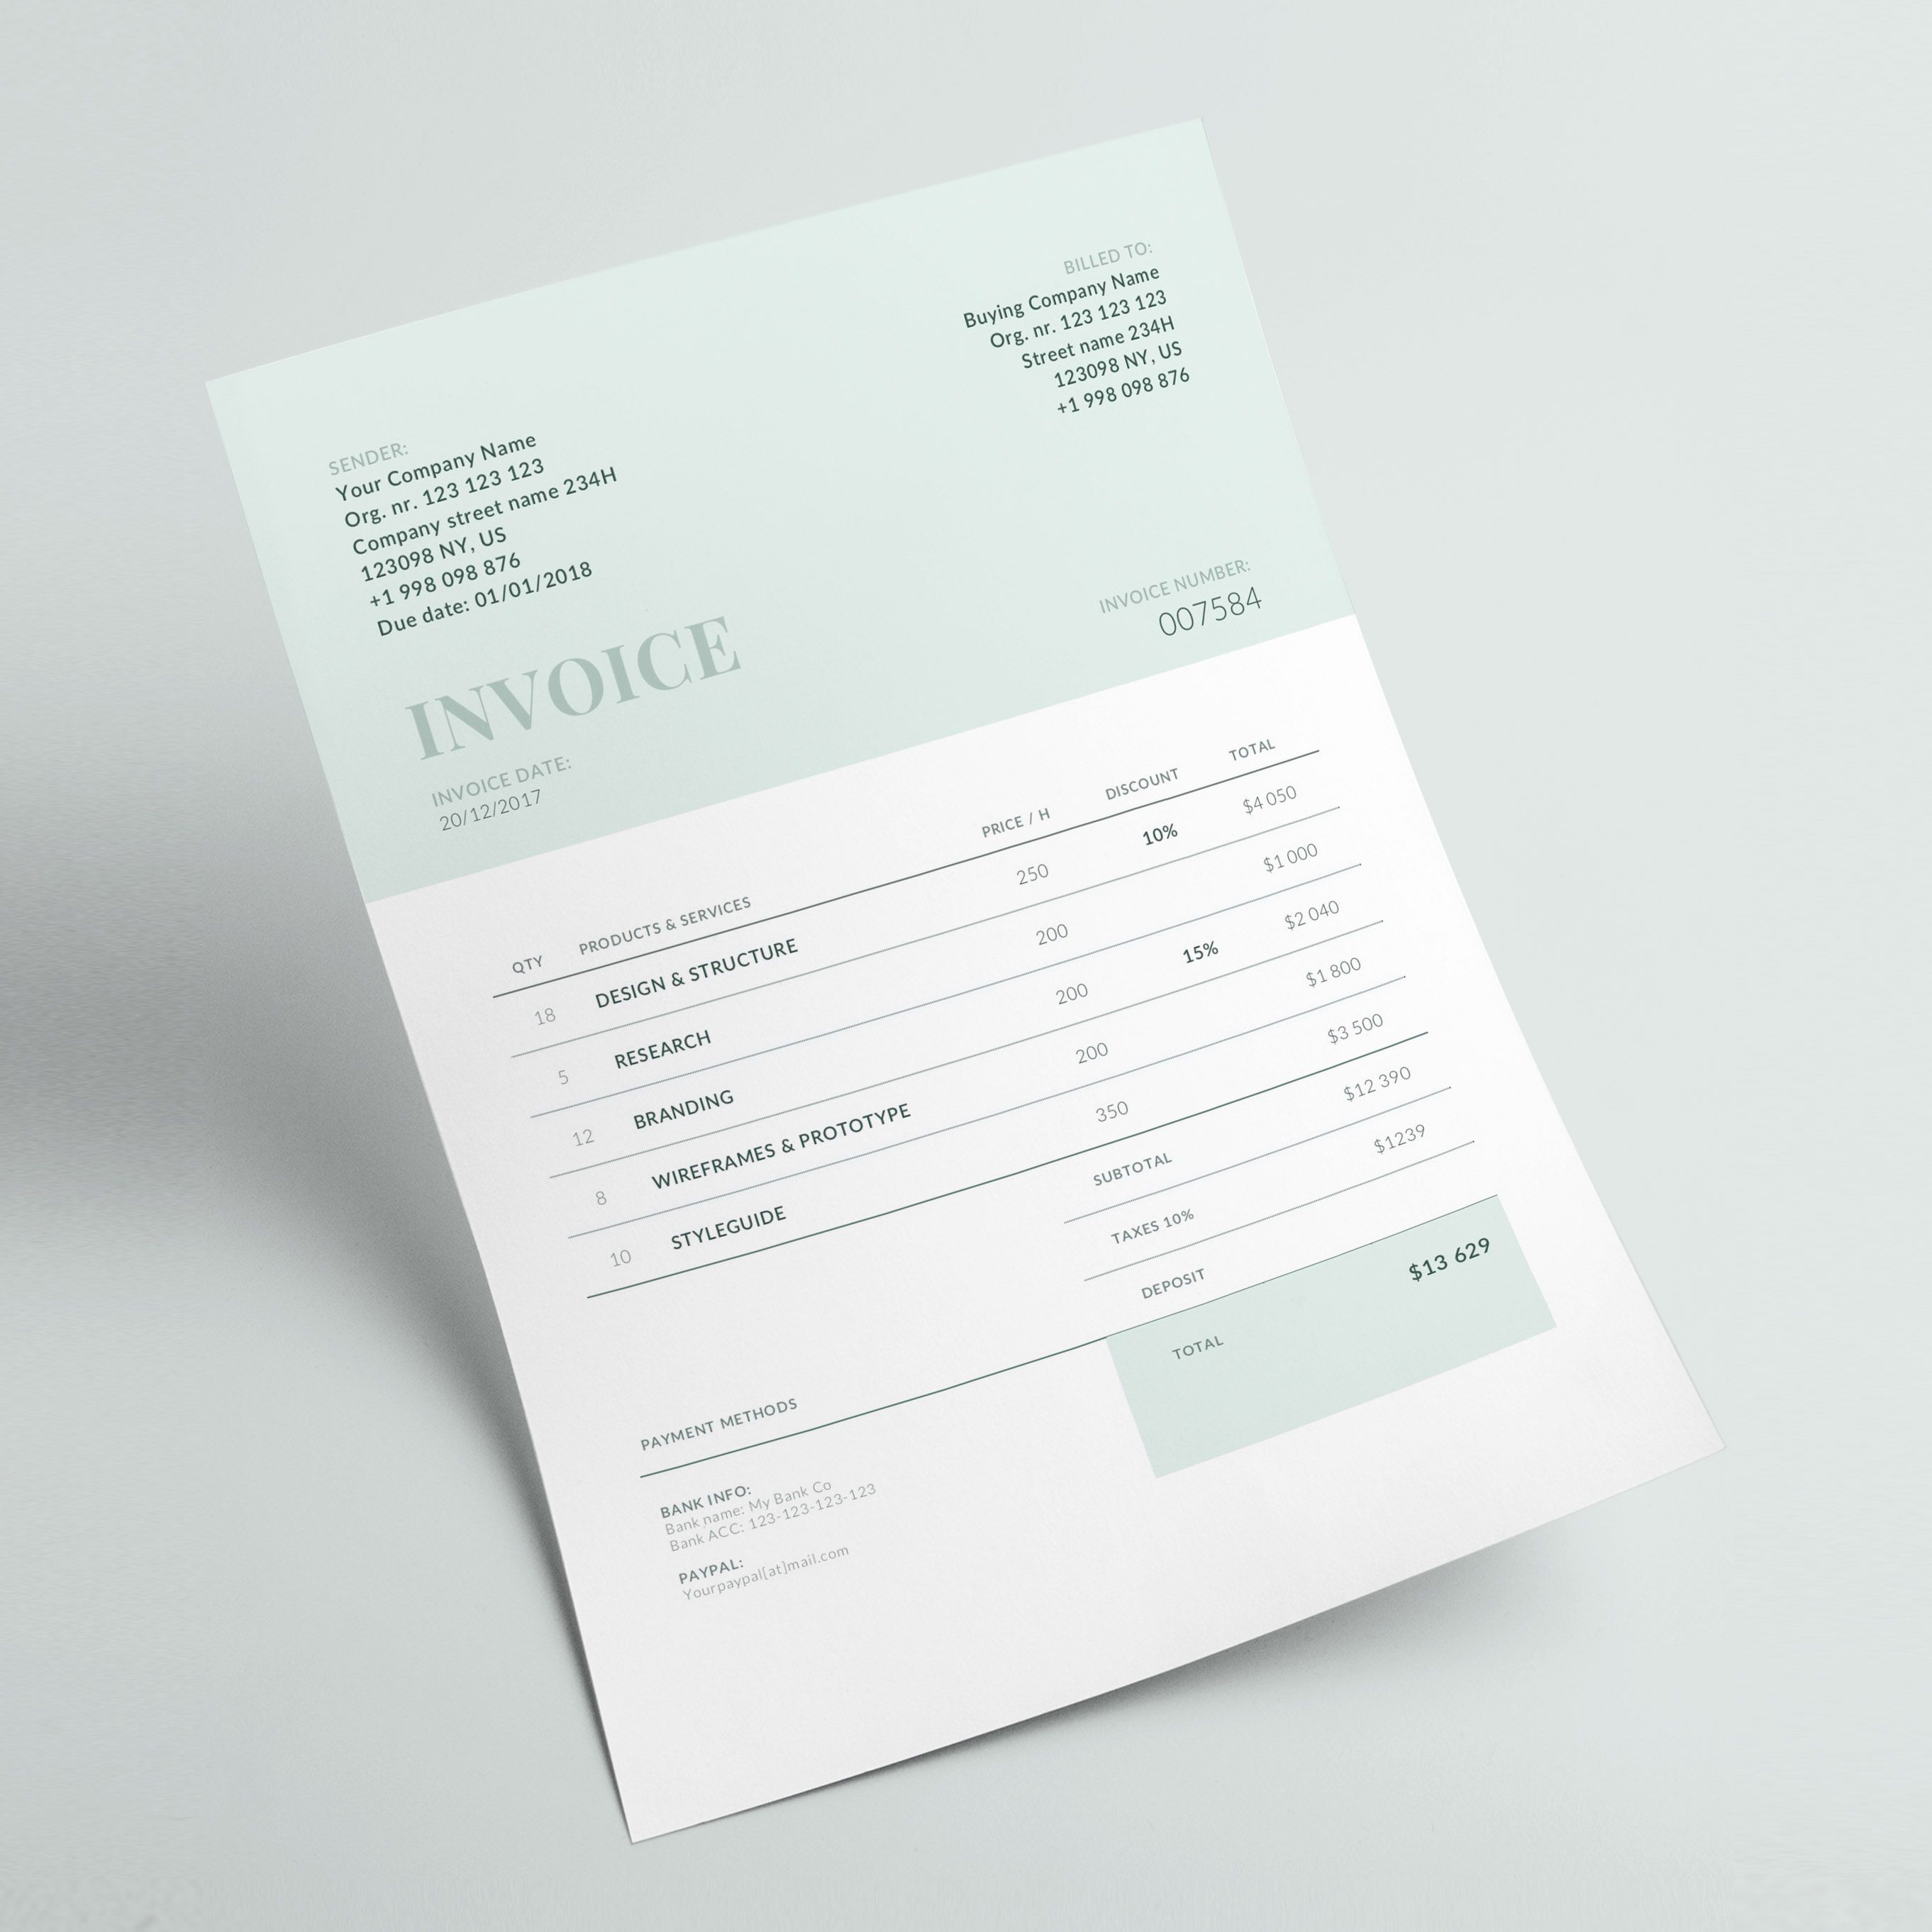 Invoice Template Business Invoice Receipt Template Etsy Invoice Template Invoice Design Invoice Design Template